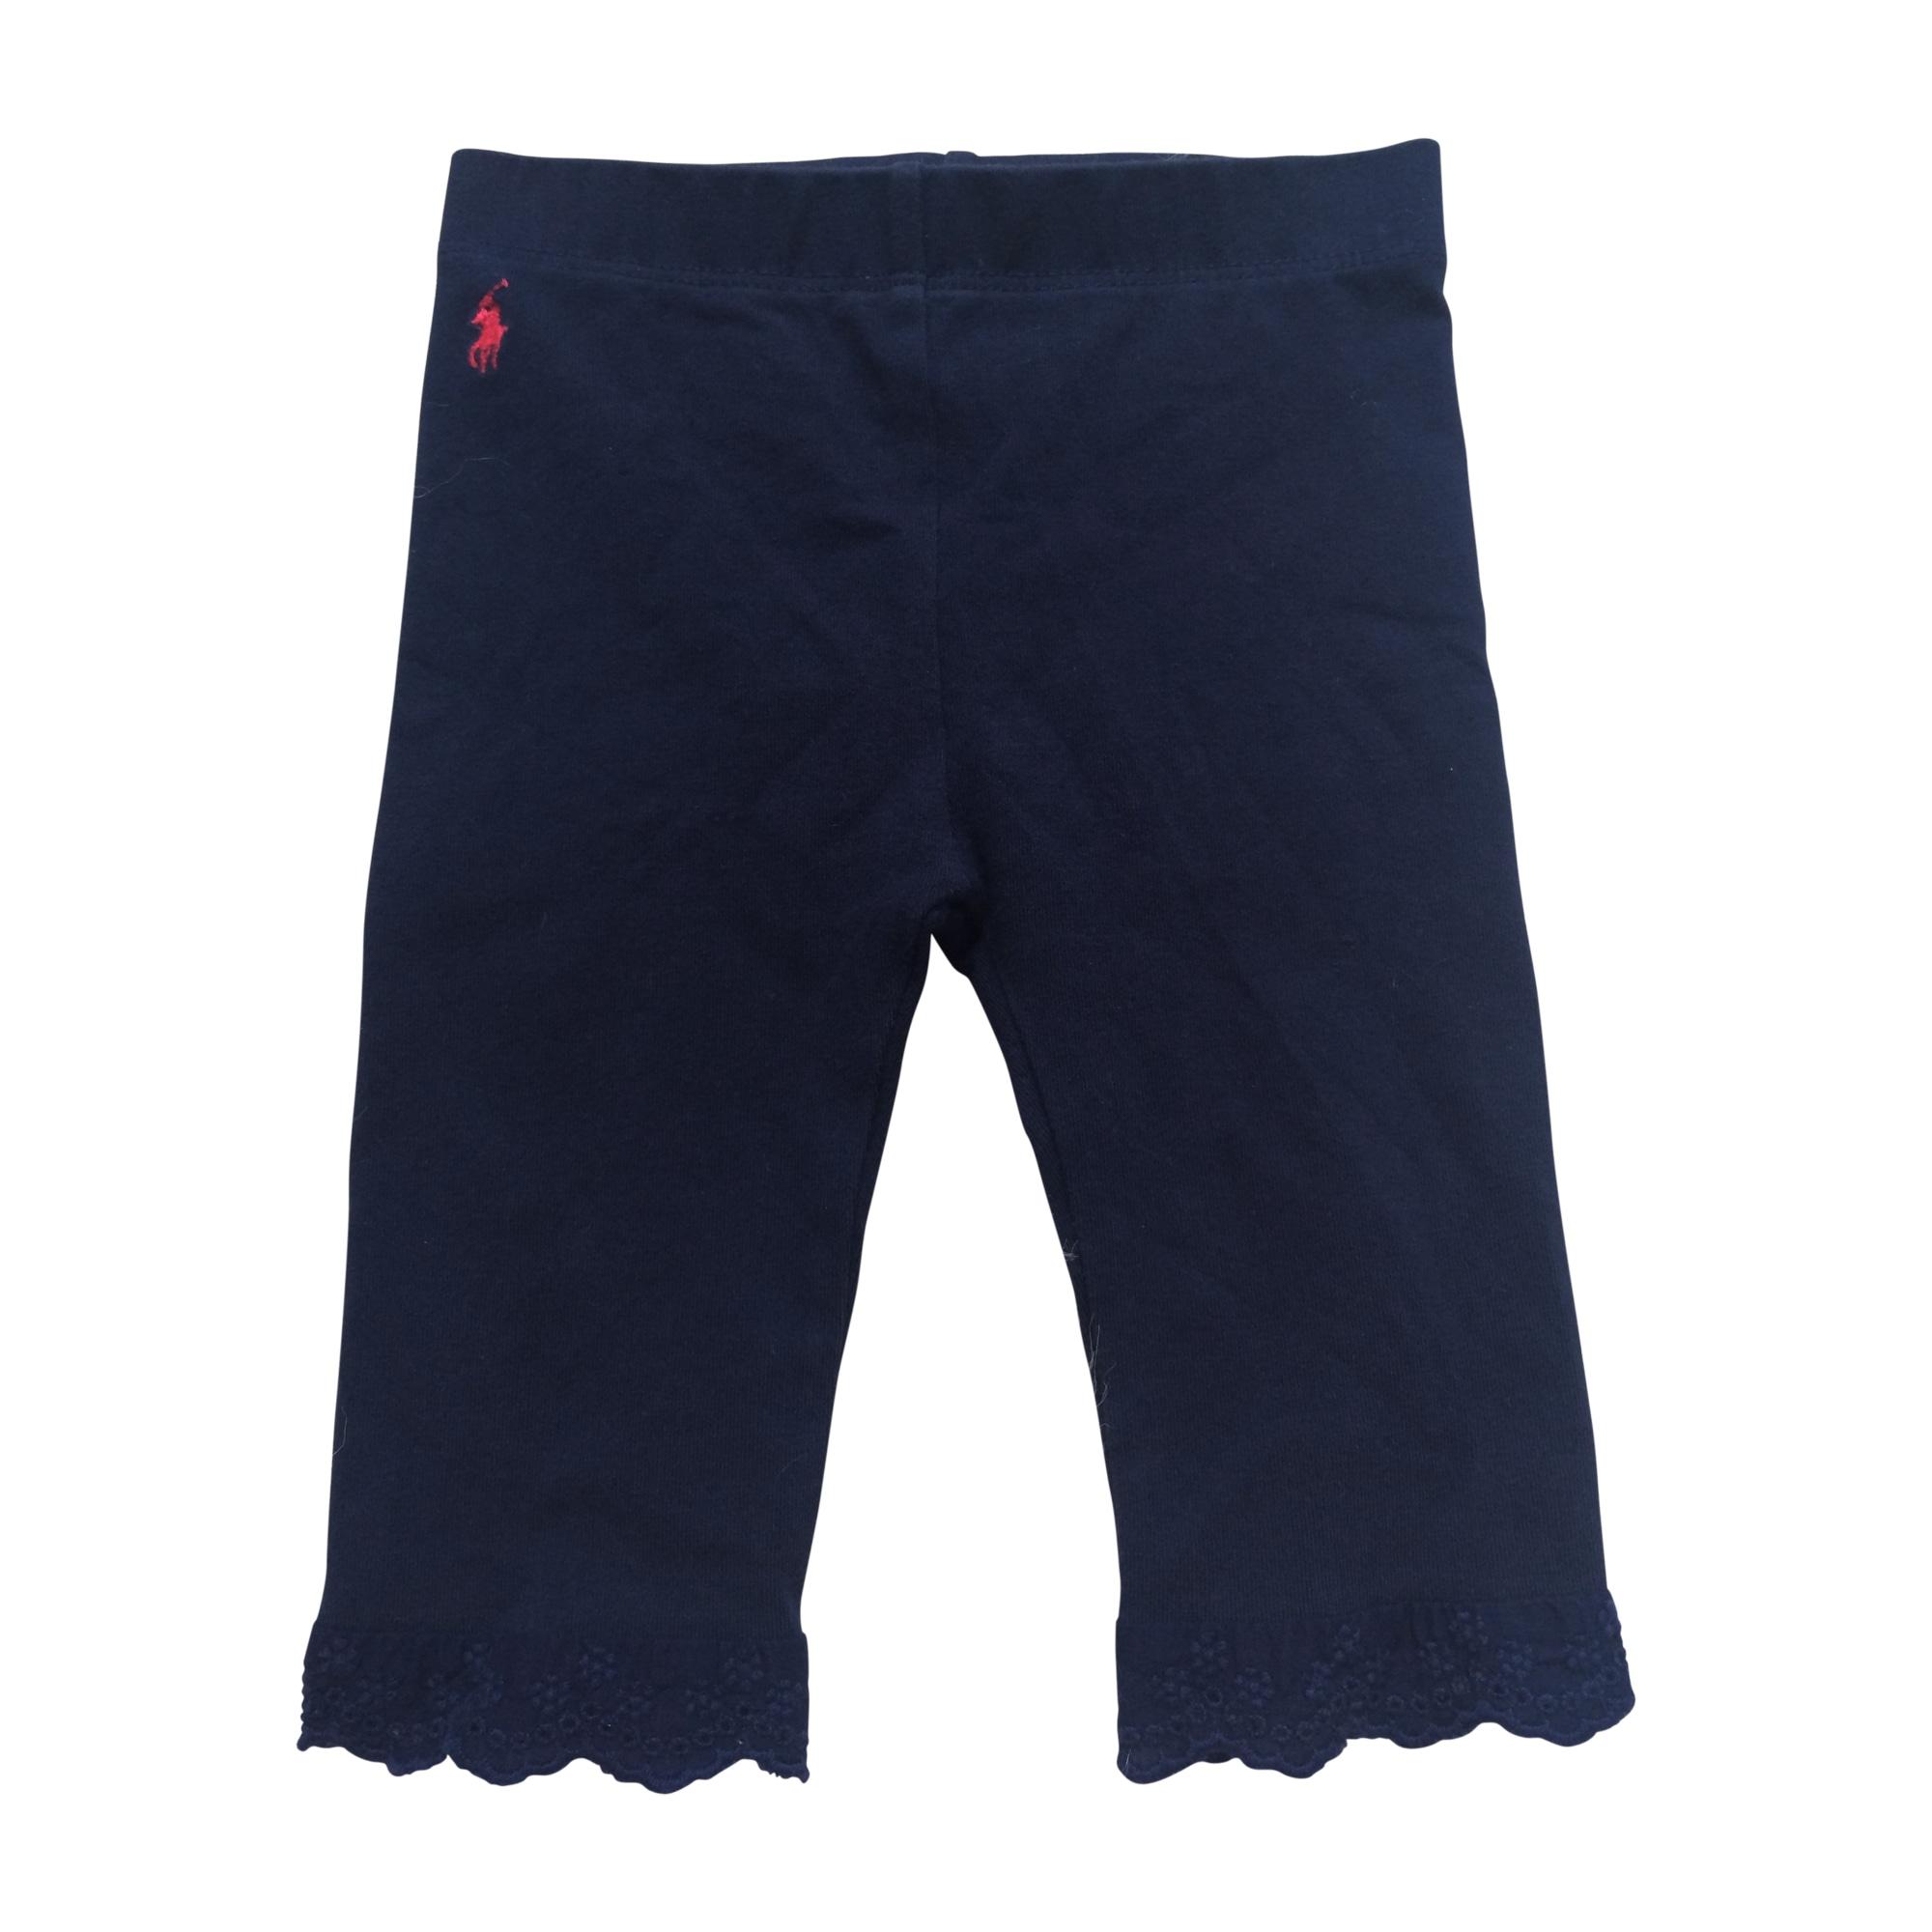 Pantalon RALPH LAUREN Bleu, bleu marine, bleu turquoise